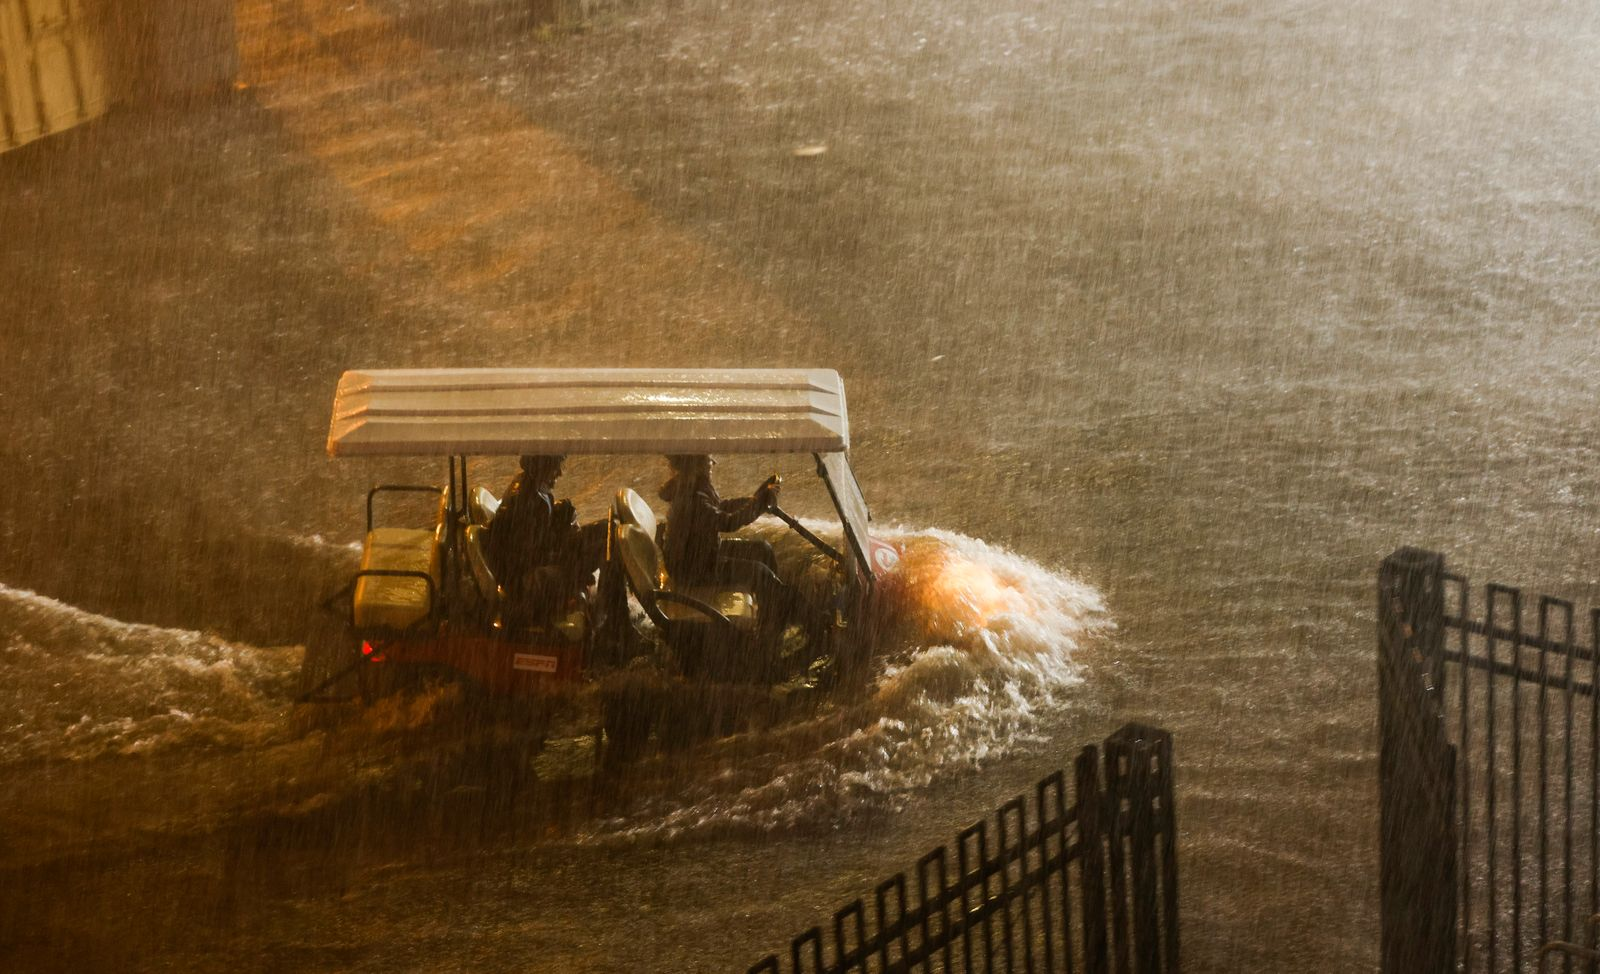 Heavy Rains in New York from Renants of Hurricane Ida